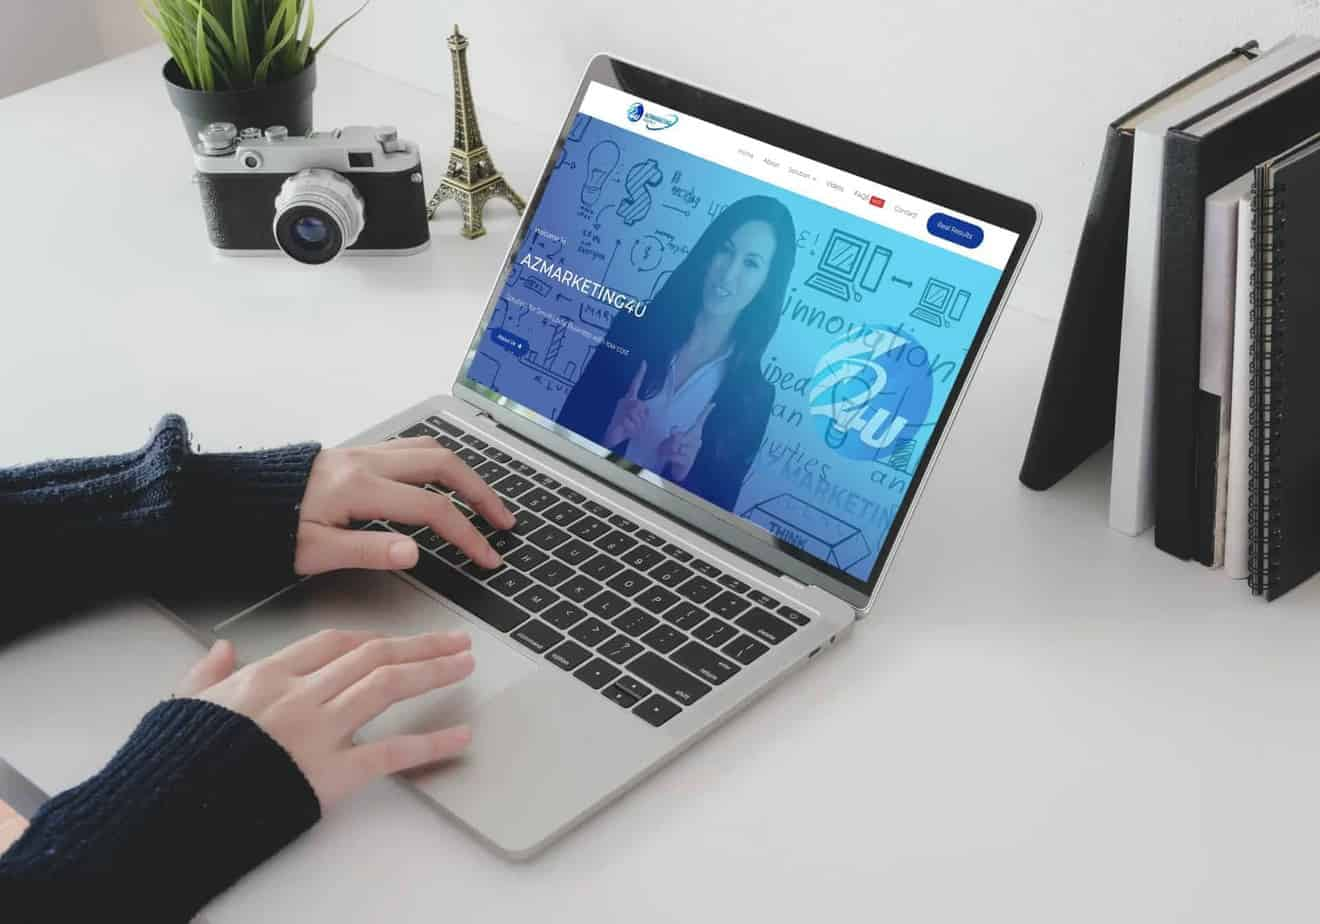 azmarketing4u-responsive-website-laptop-display